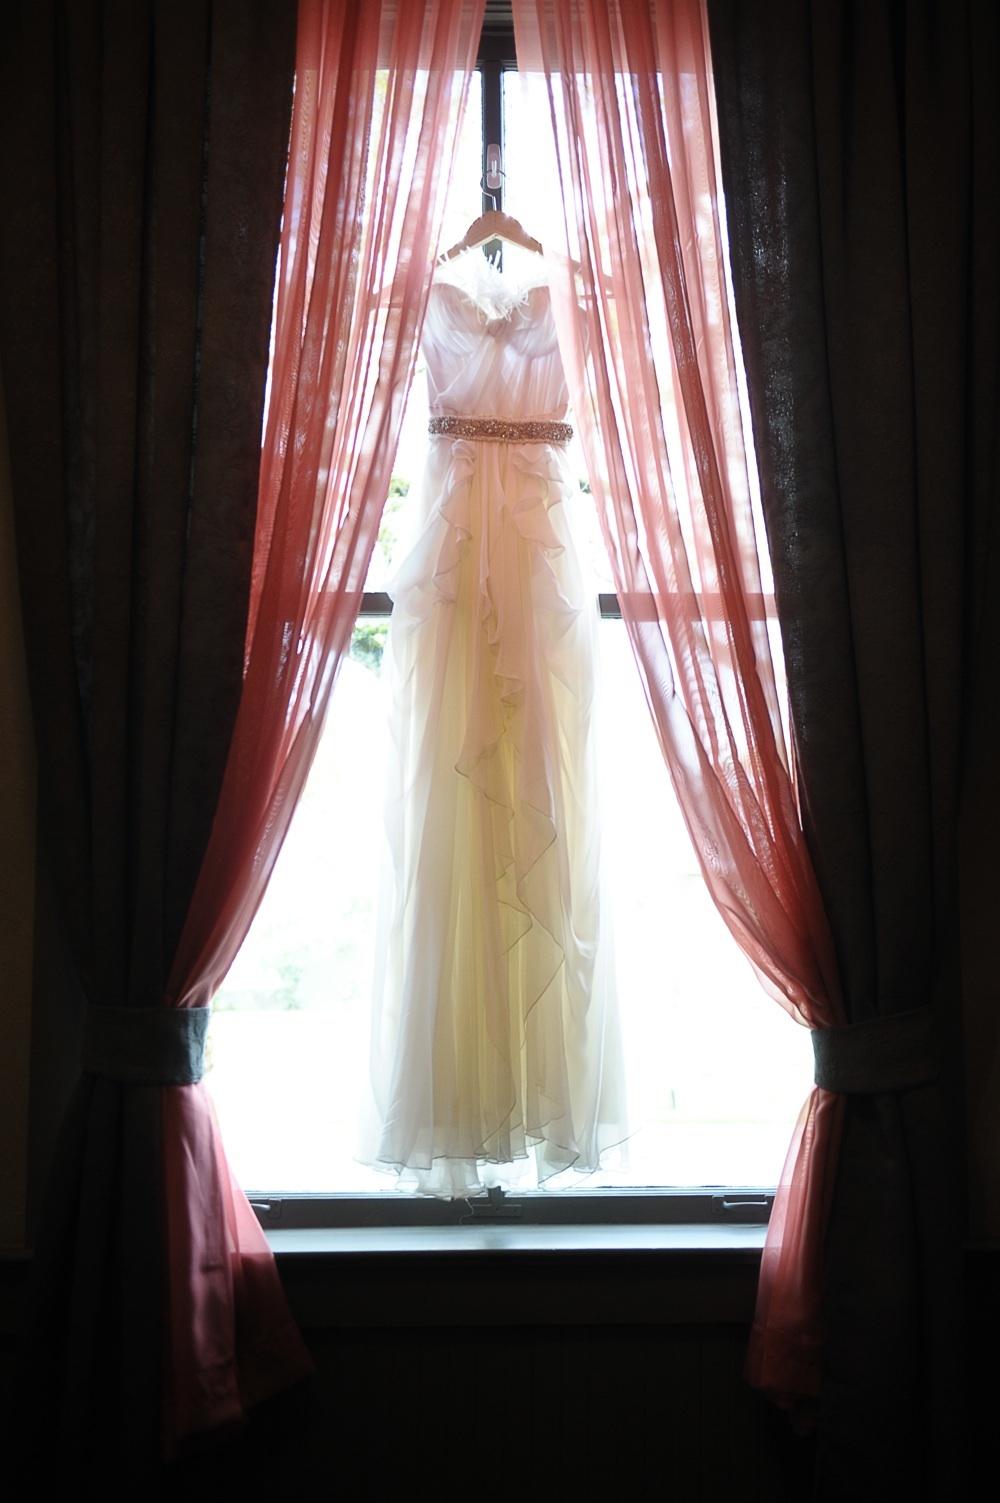 Wedding-photography-must-have-detail-shots-for-brides-hanging-wedding-dress-princess-bride.full